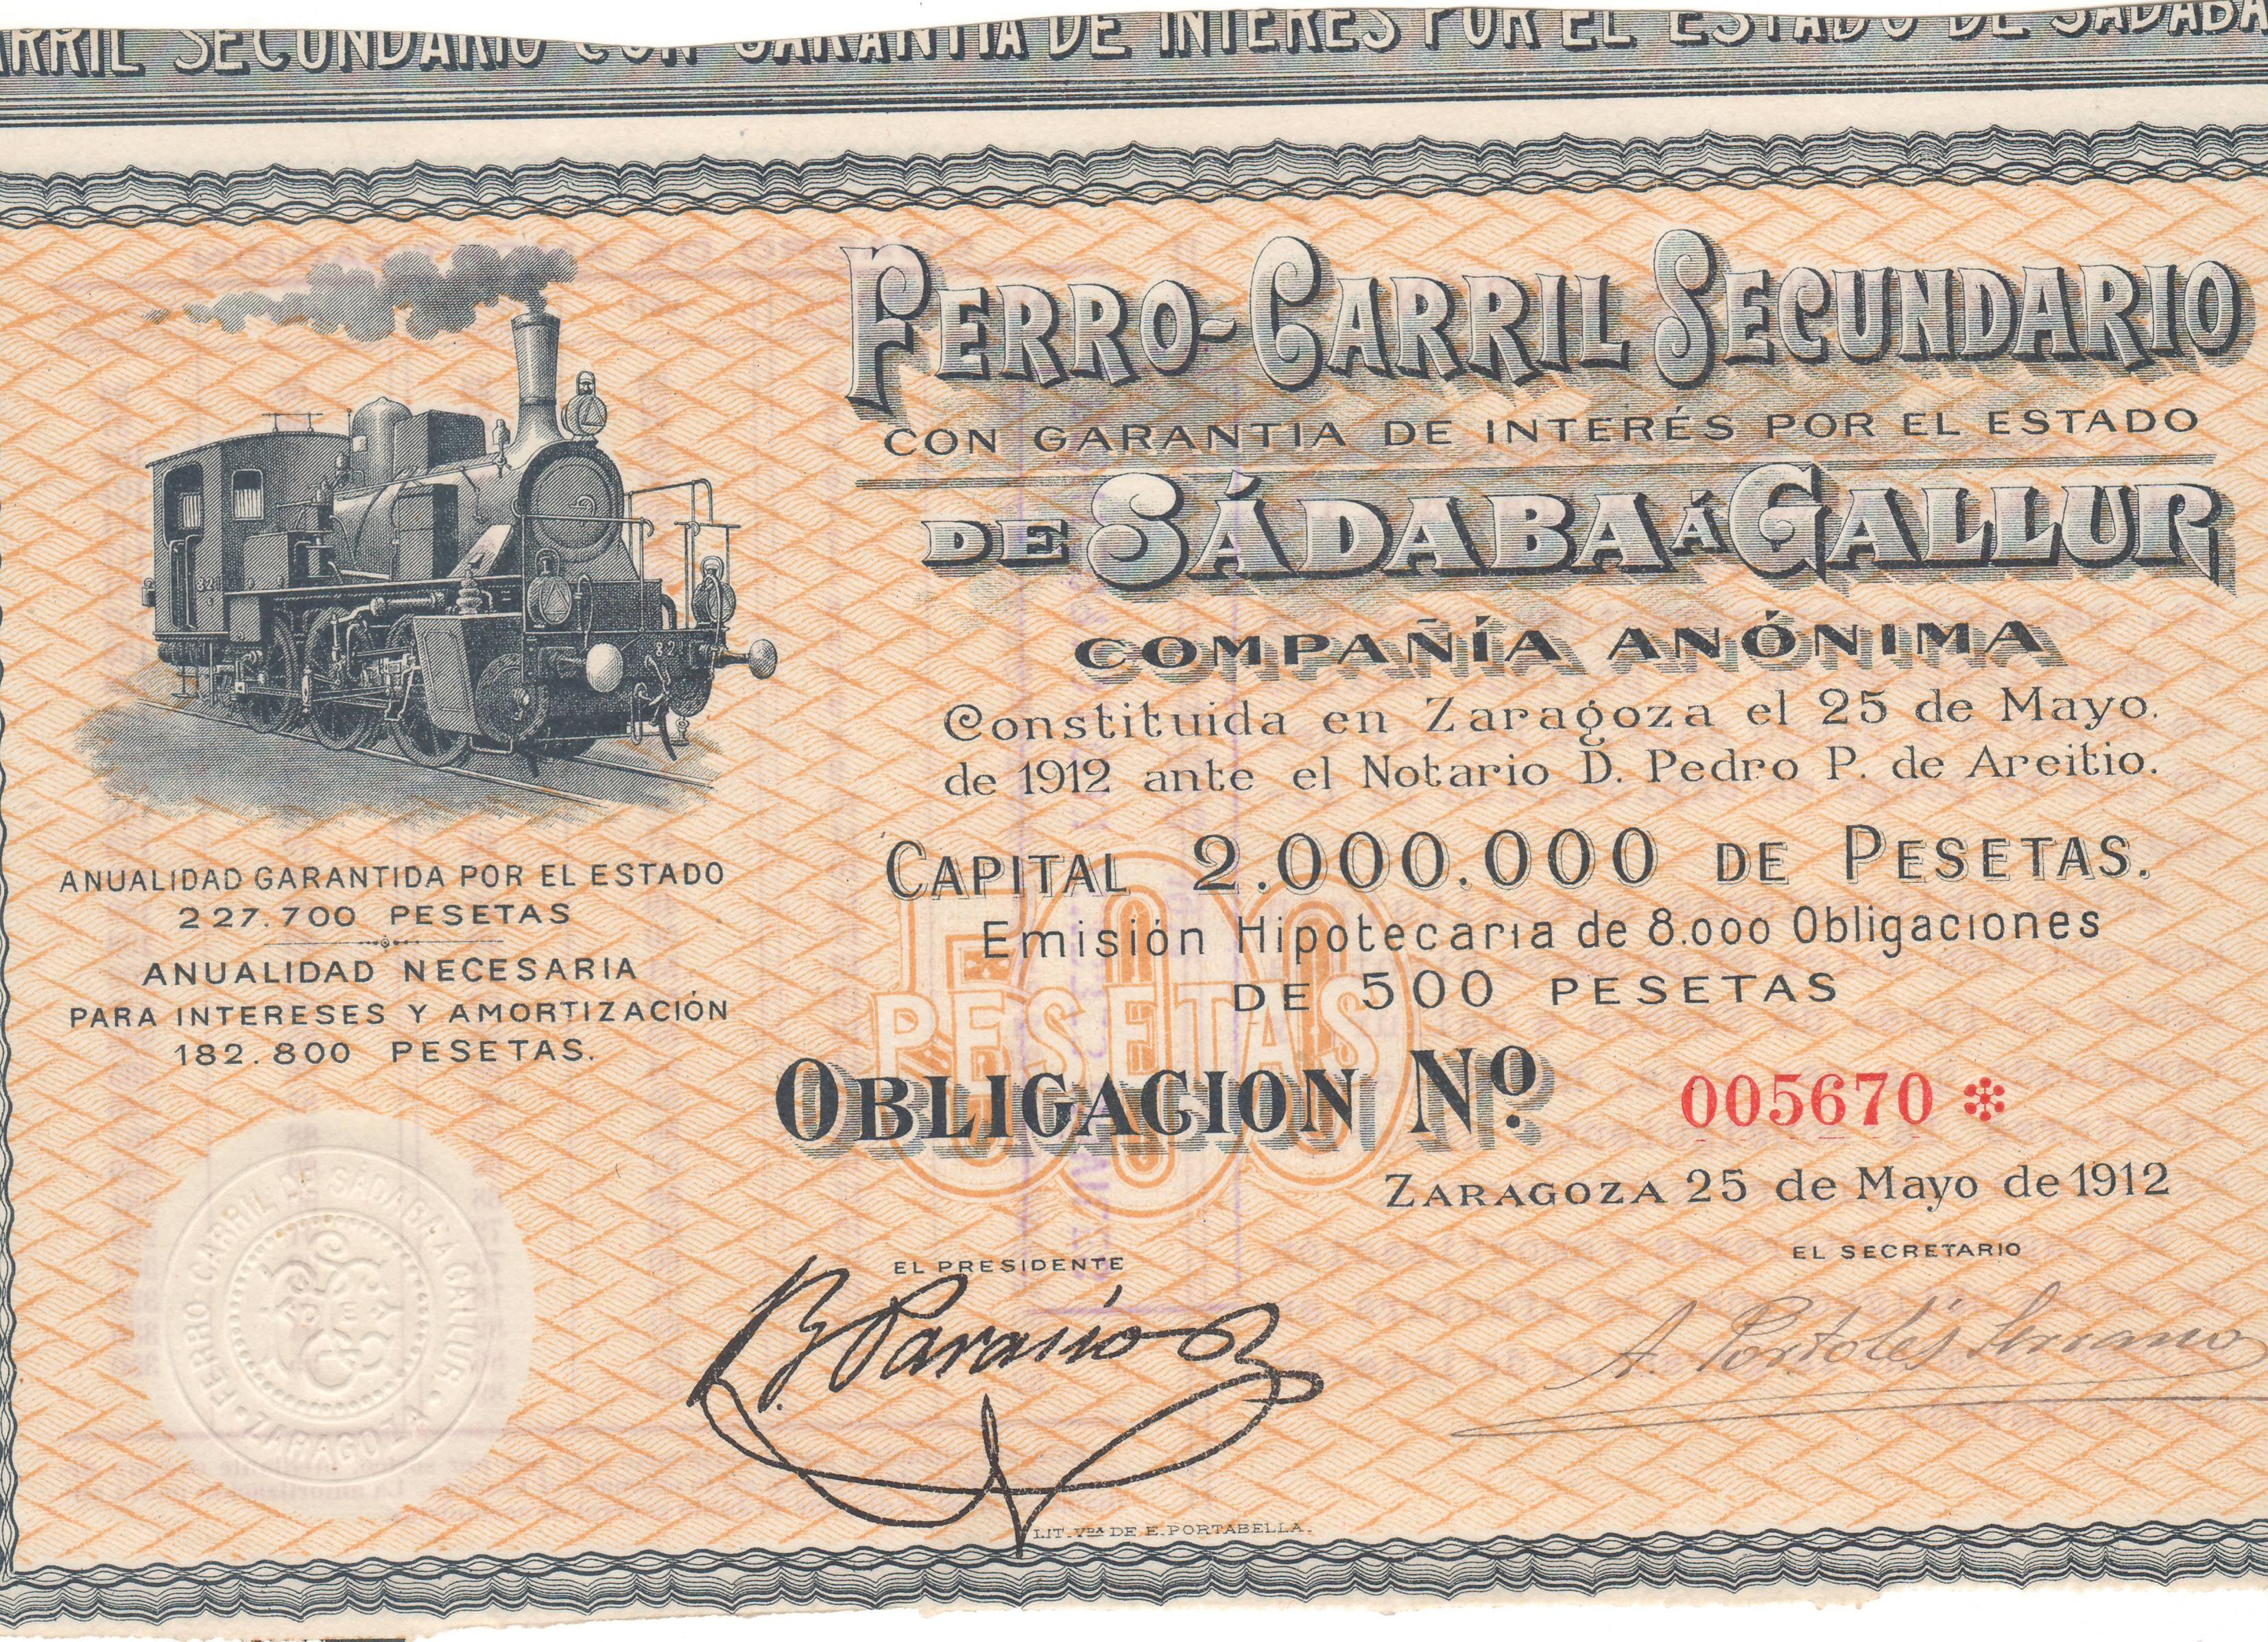 Ferrocarril Secundario de Sádaba a Gallur